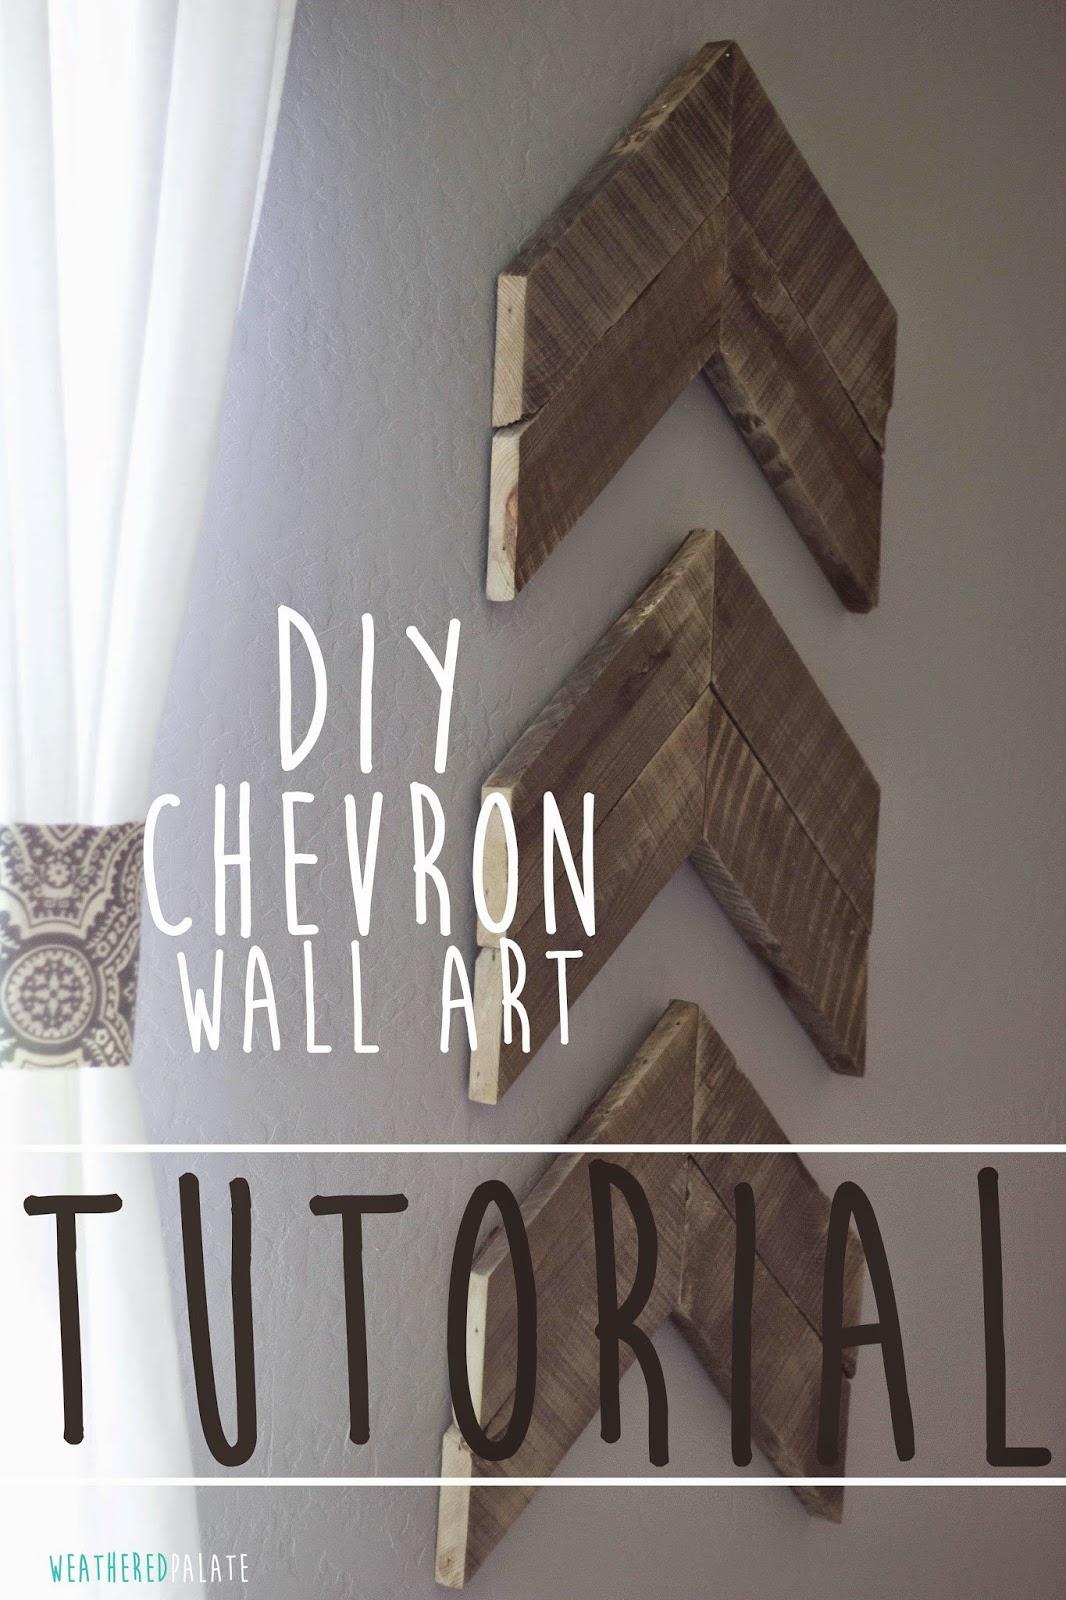 http://www.theweatheredpalate.com/2014/09/diy-chevron-wall-art-tutorial.html